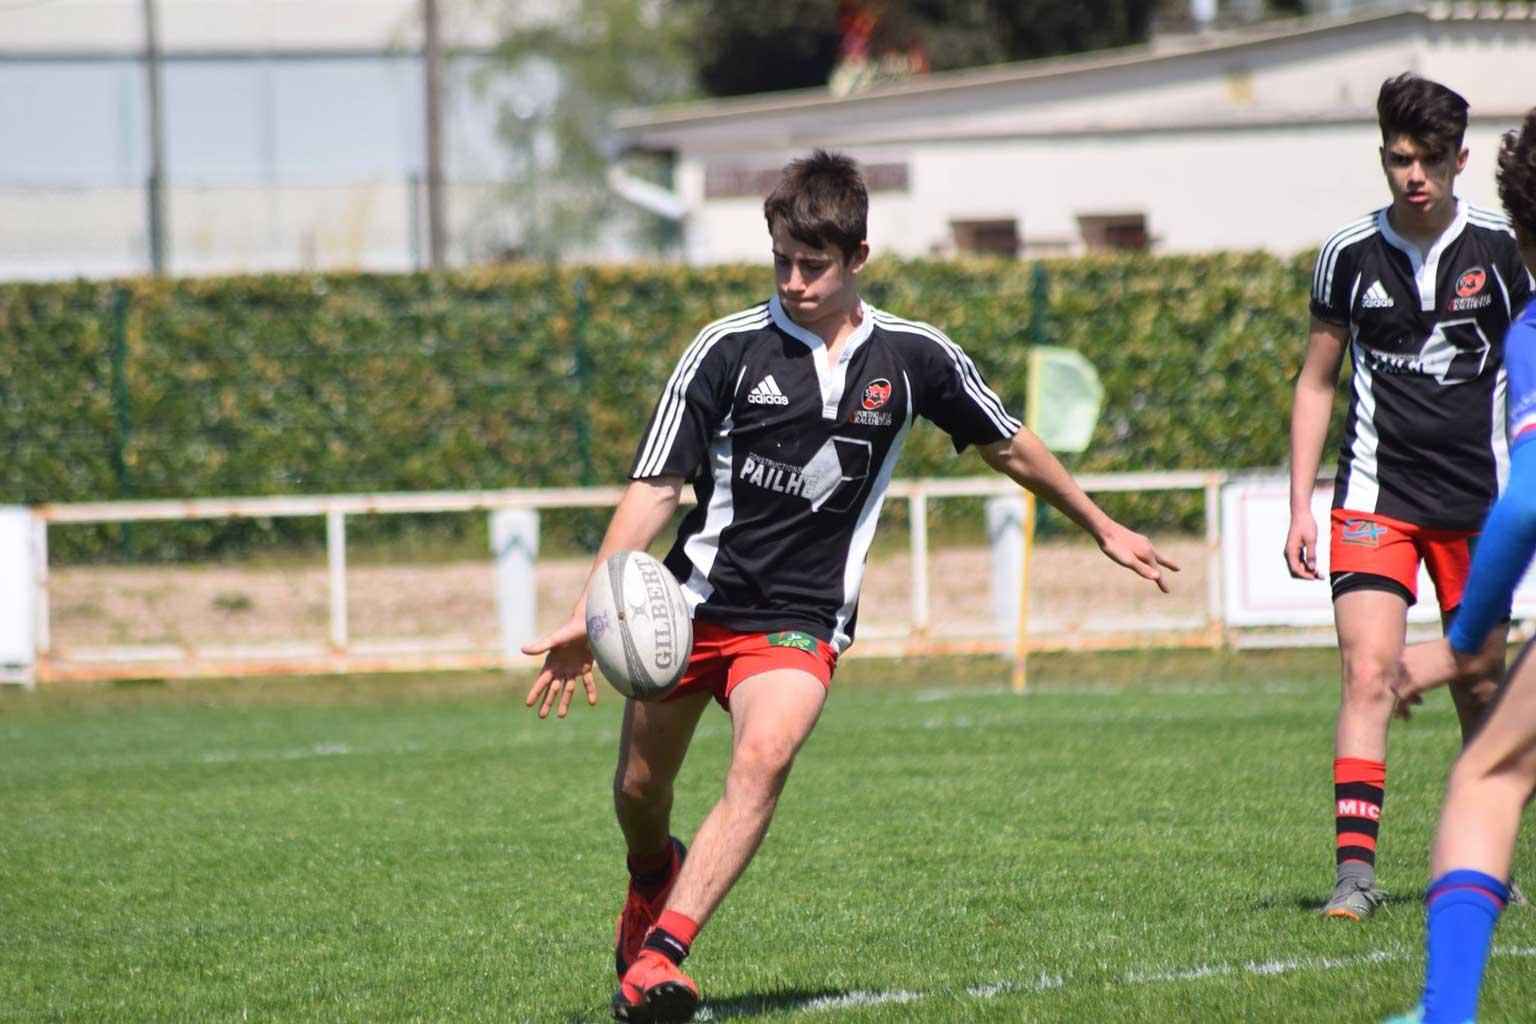 © 2019 Maeva Franco - U16 - S.C. Graulhet vs TUC